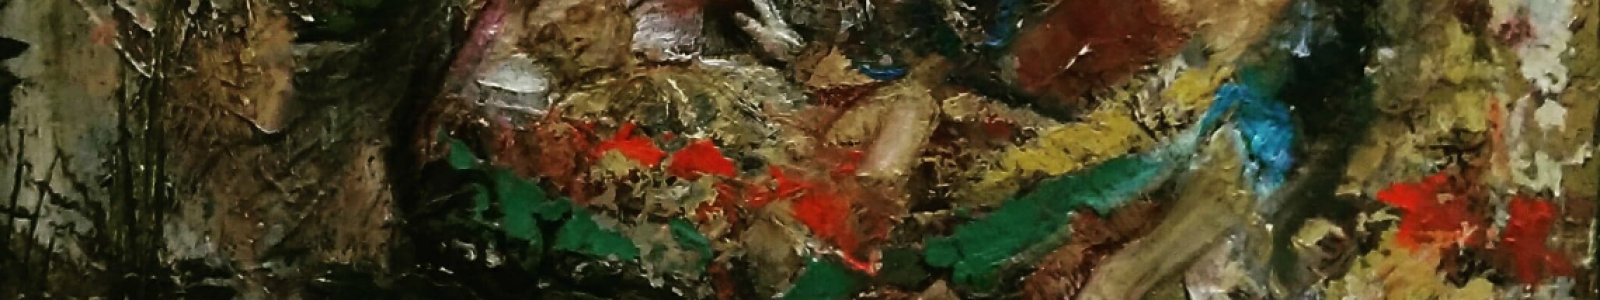 Gallery Painter samir kerimoglu